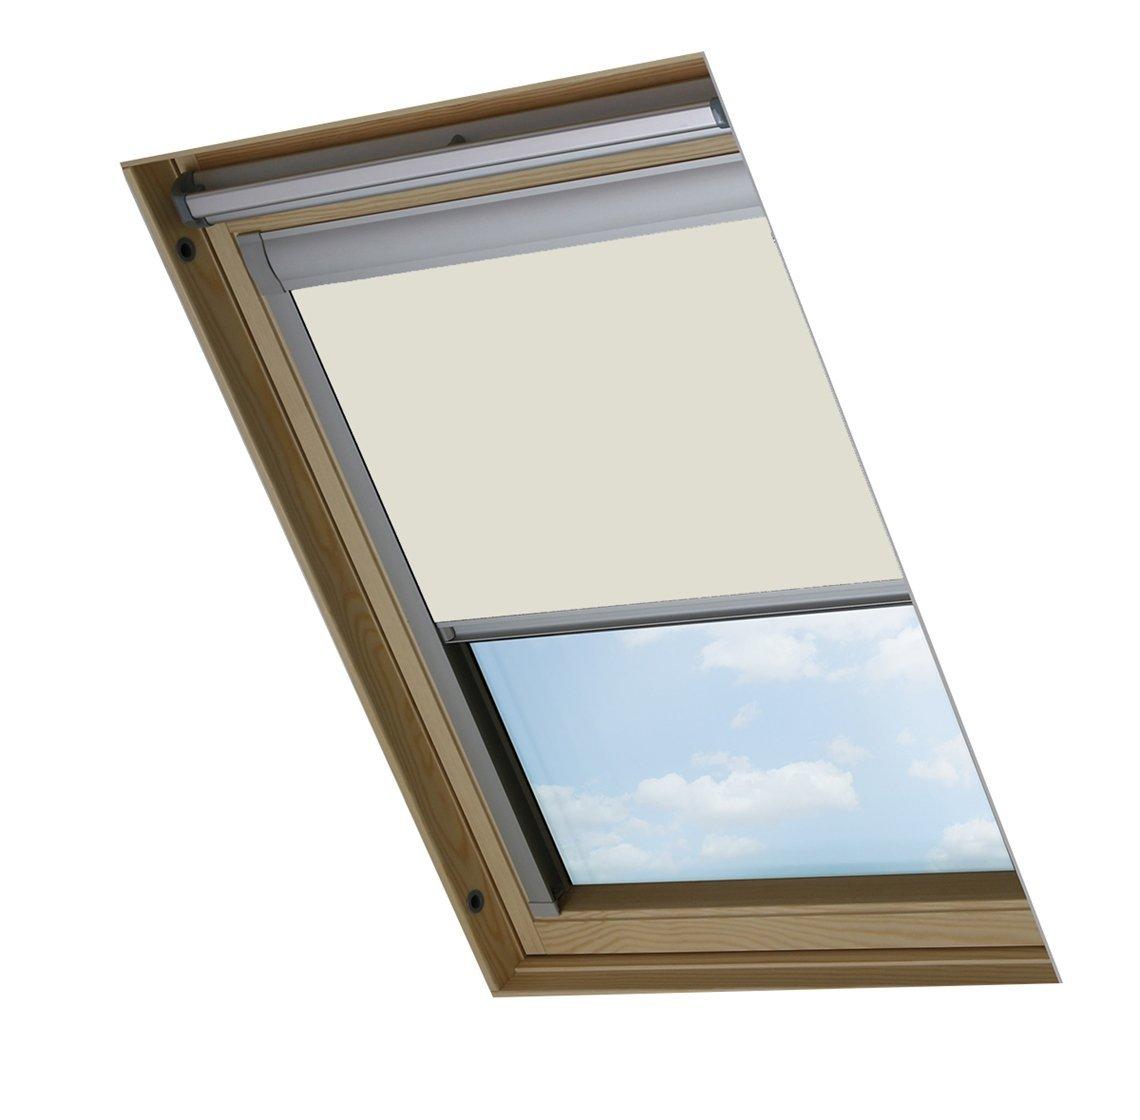 Bloc Skylight Blind CK04per finestre da tetto Velux Blockout, nero Bloc Blinds